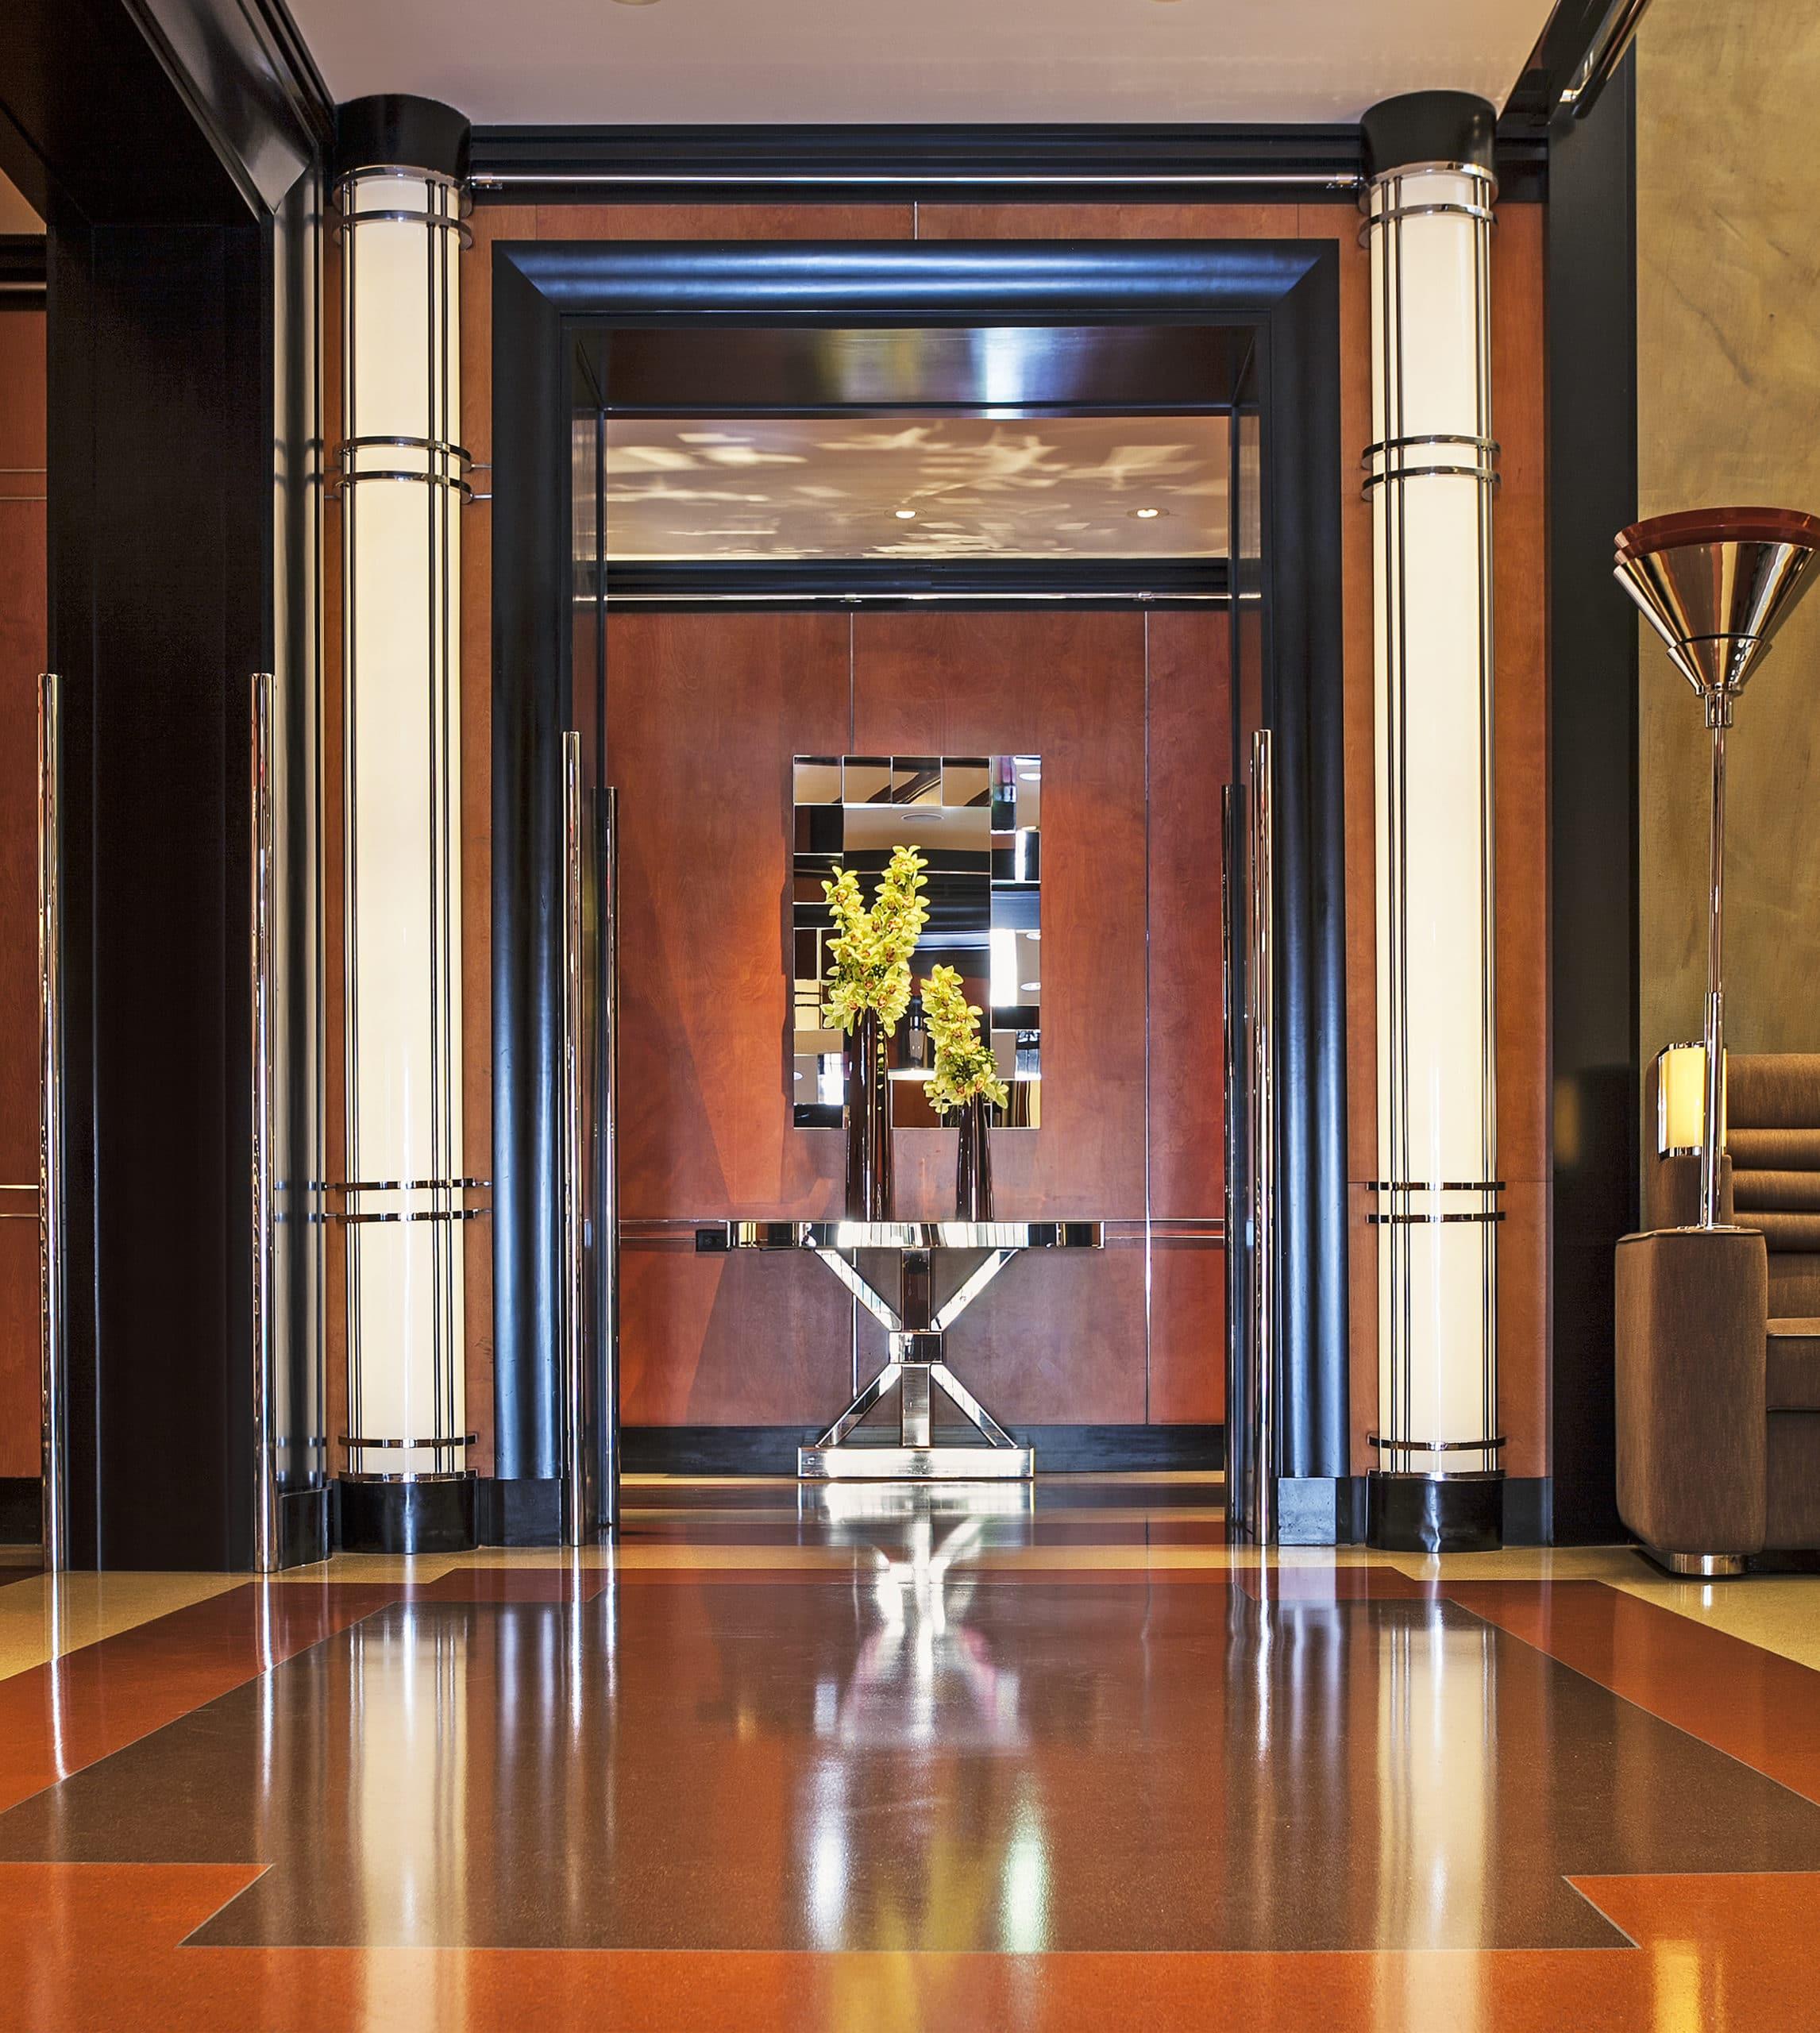 Art Deco Hotels That Every Design Lover Should Visit